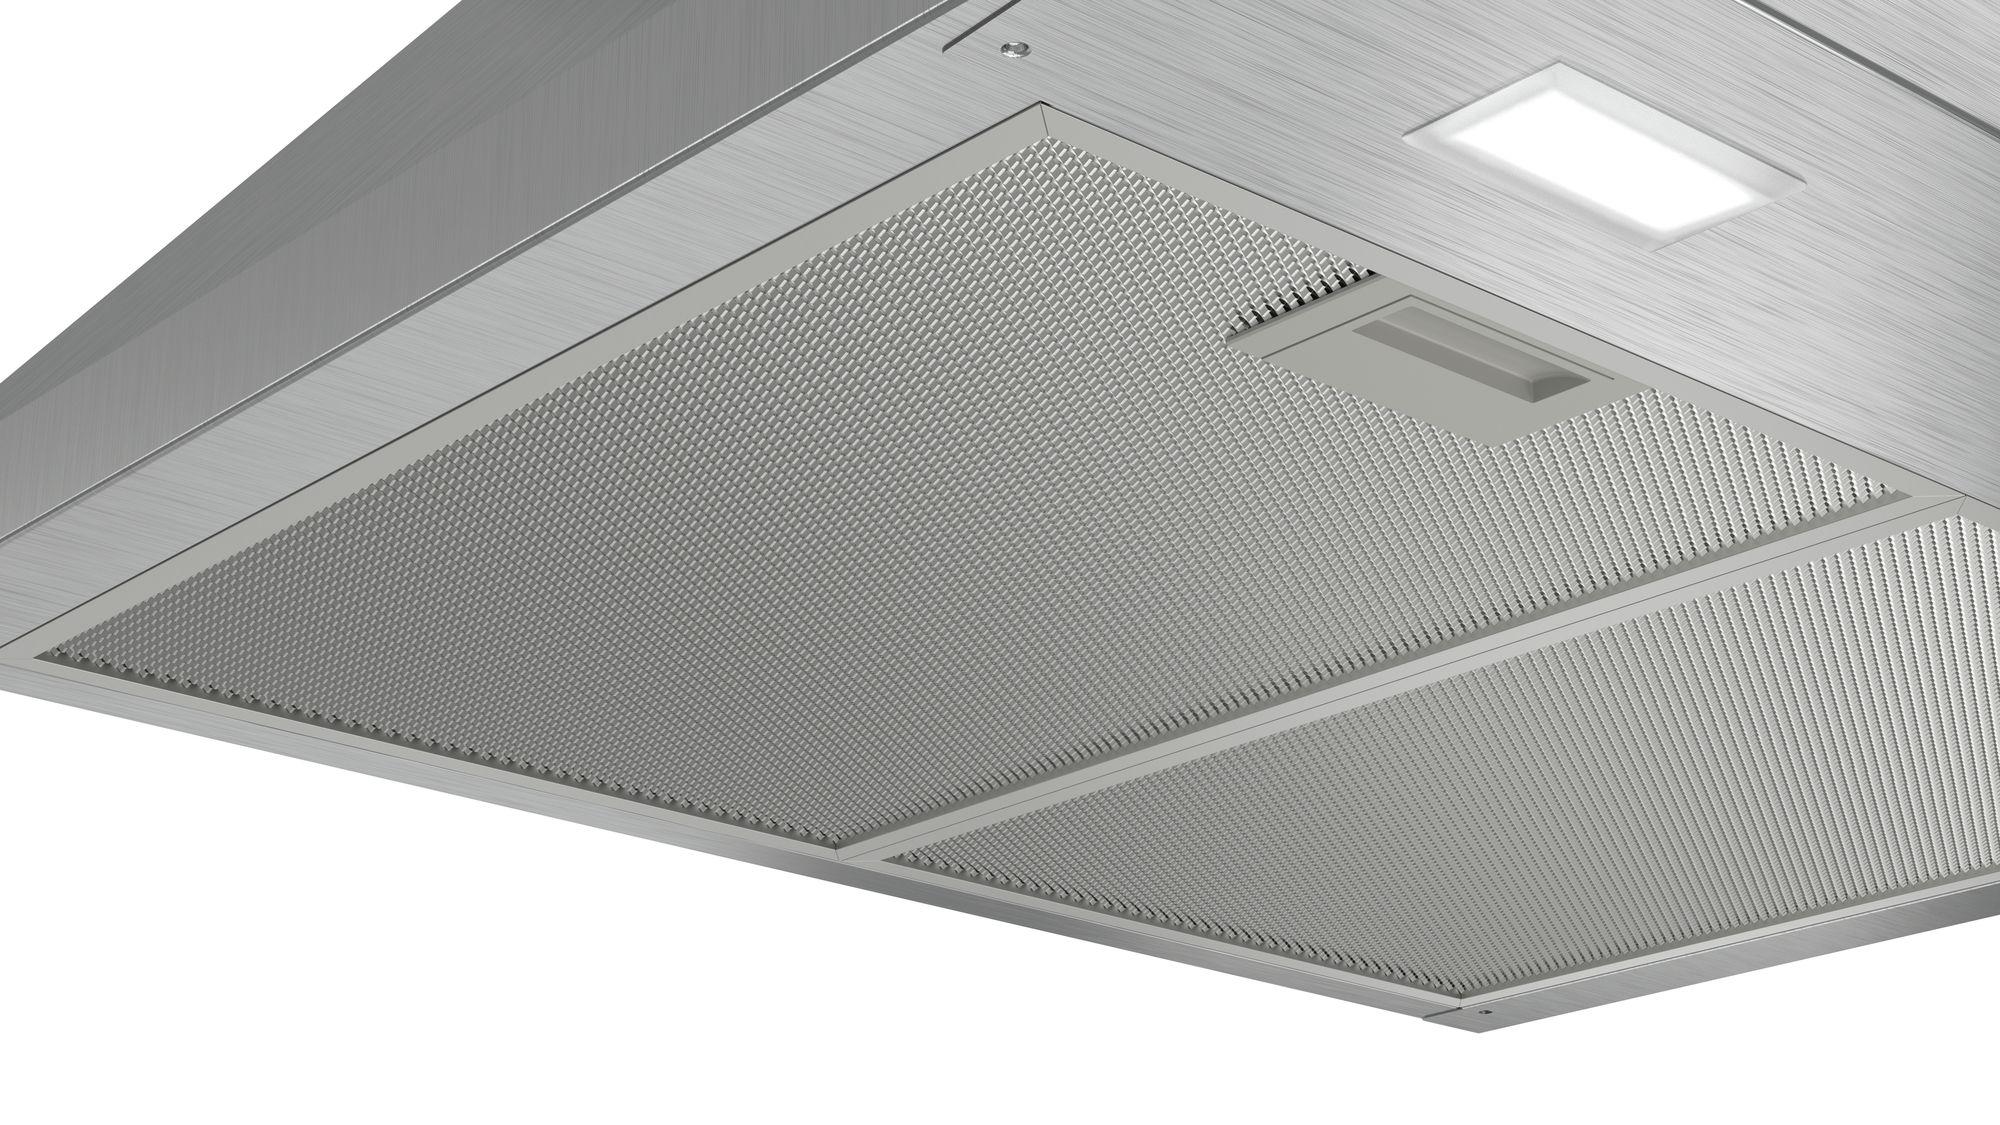 Bosch dwp64bc50 dunstabzugshaube im walmdach design farbe edelstahl